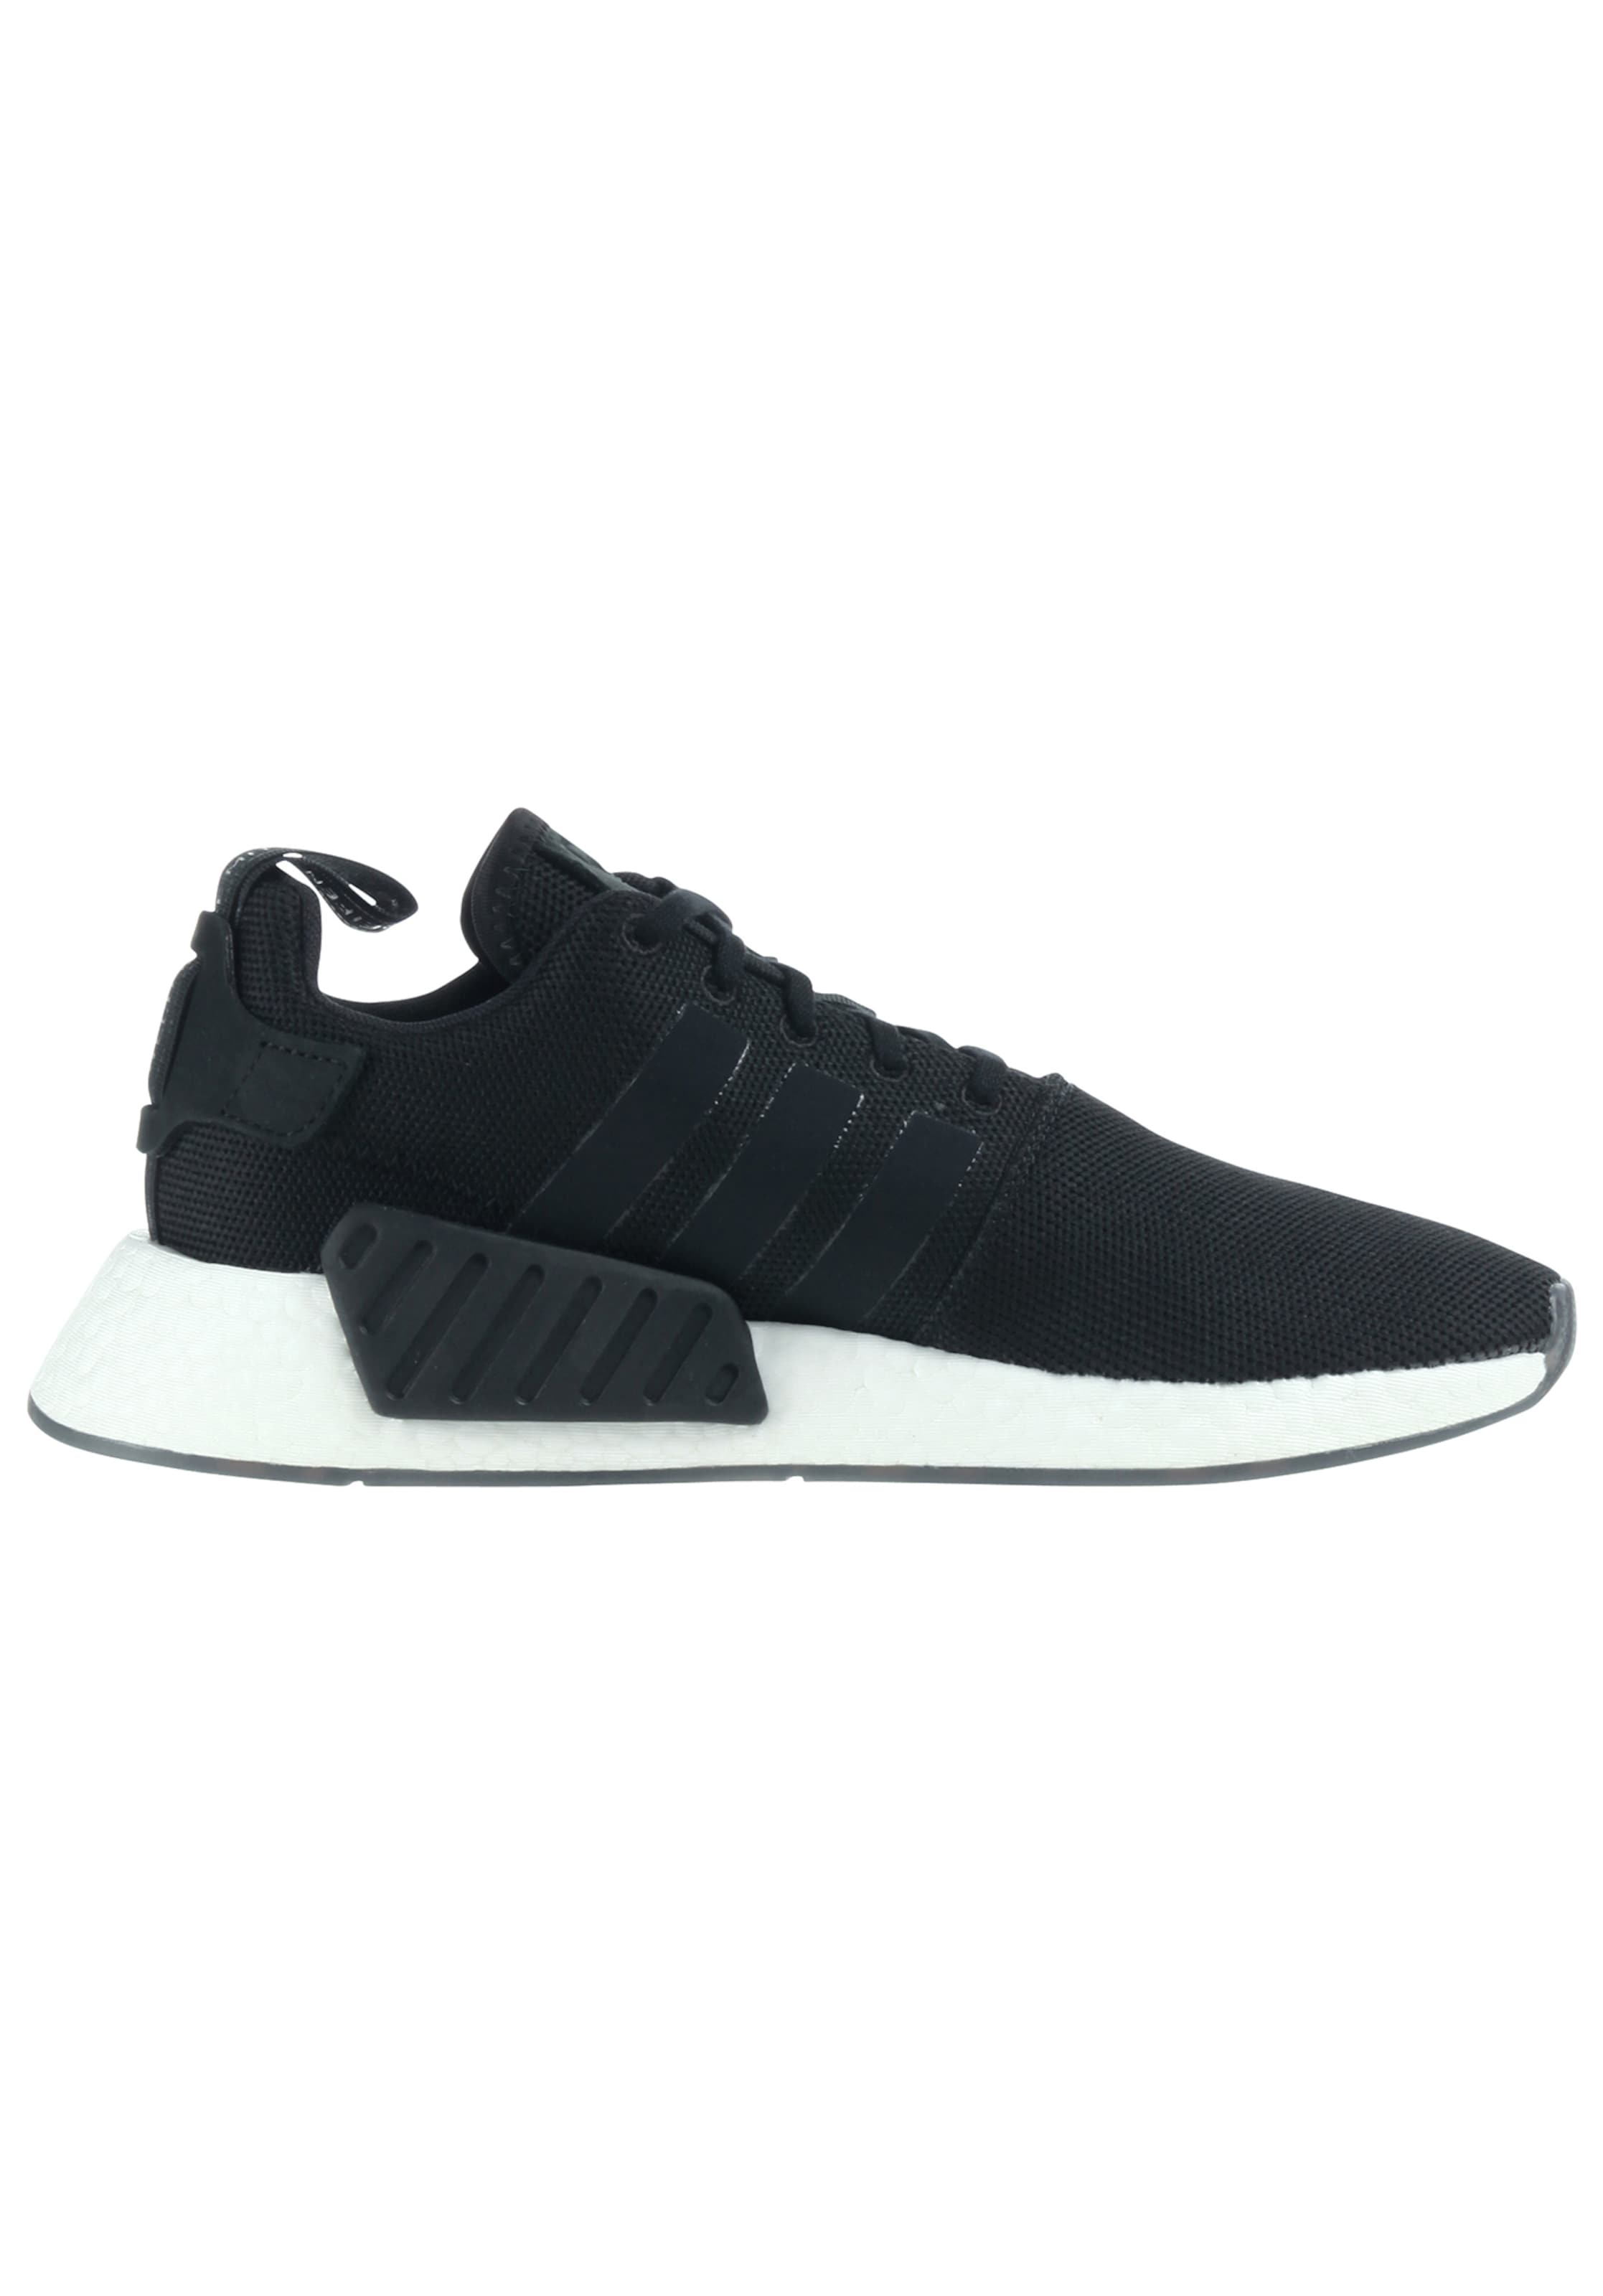 ADIDAS ORIGINALS Sneaker  Nmd_R2